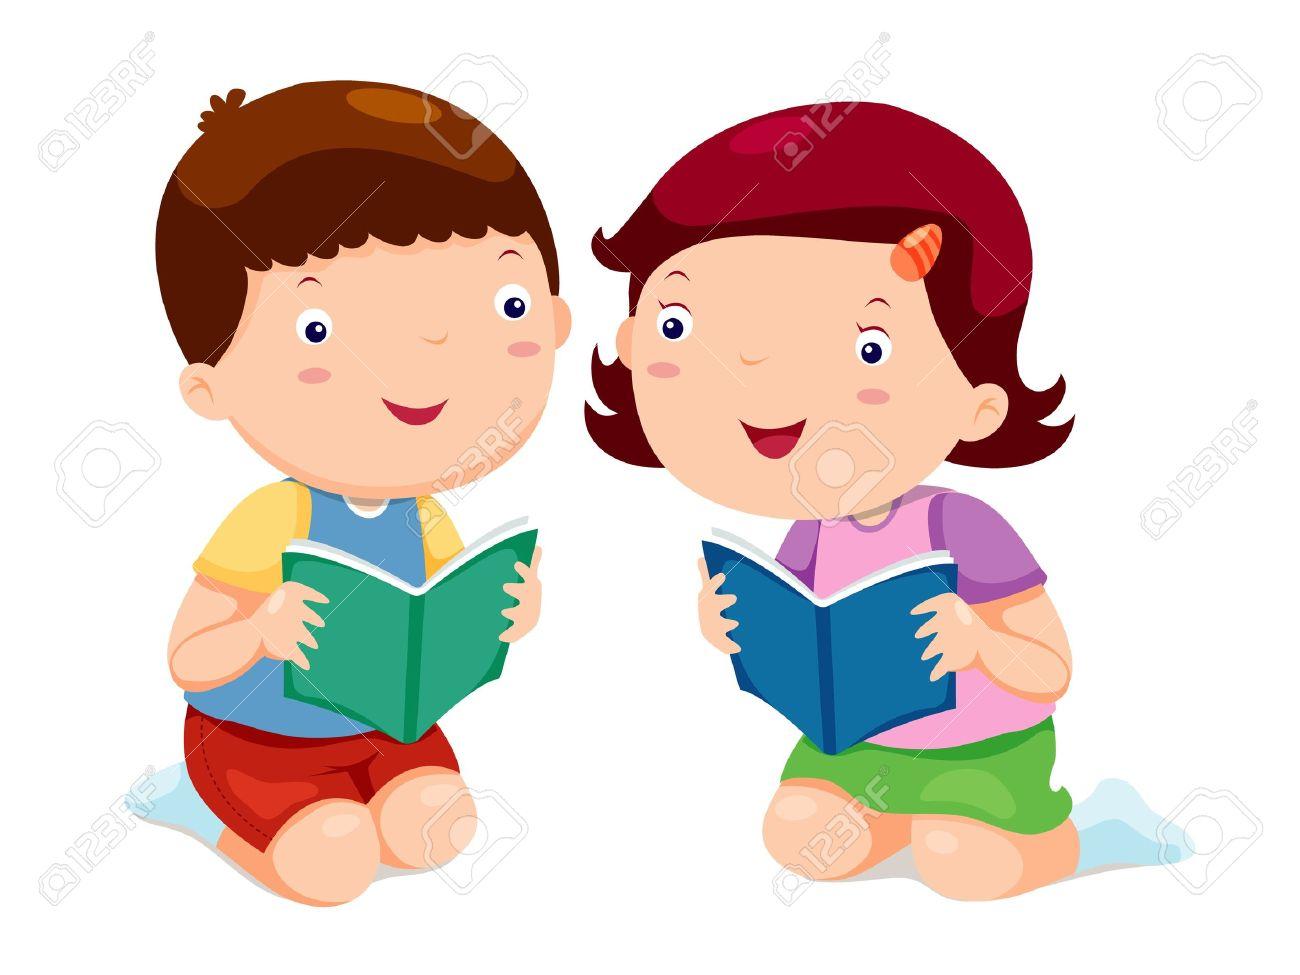 Cartoon Pics Reading Books Kids Reading Books Cartoon